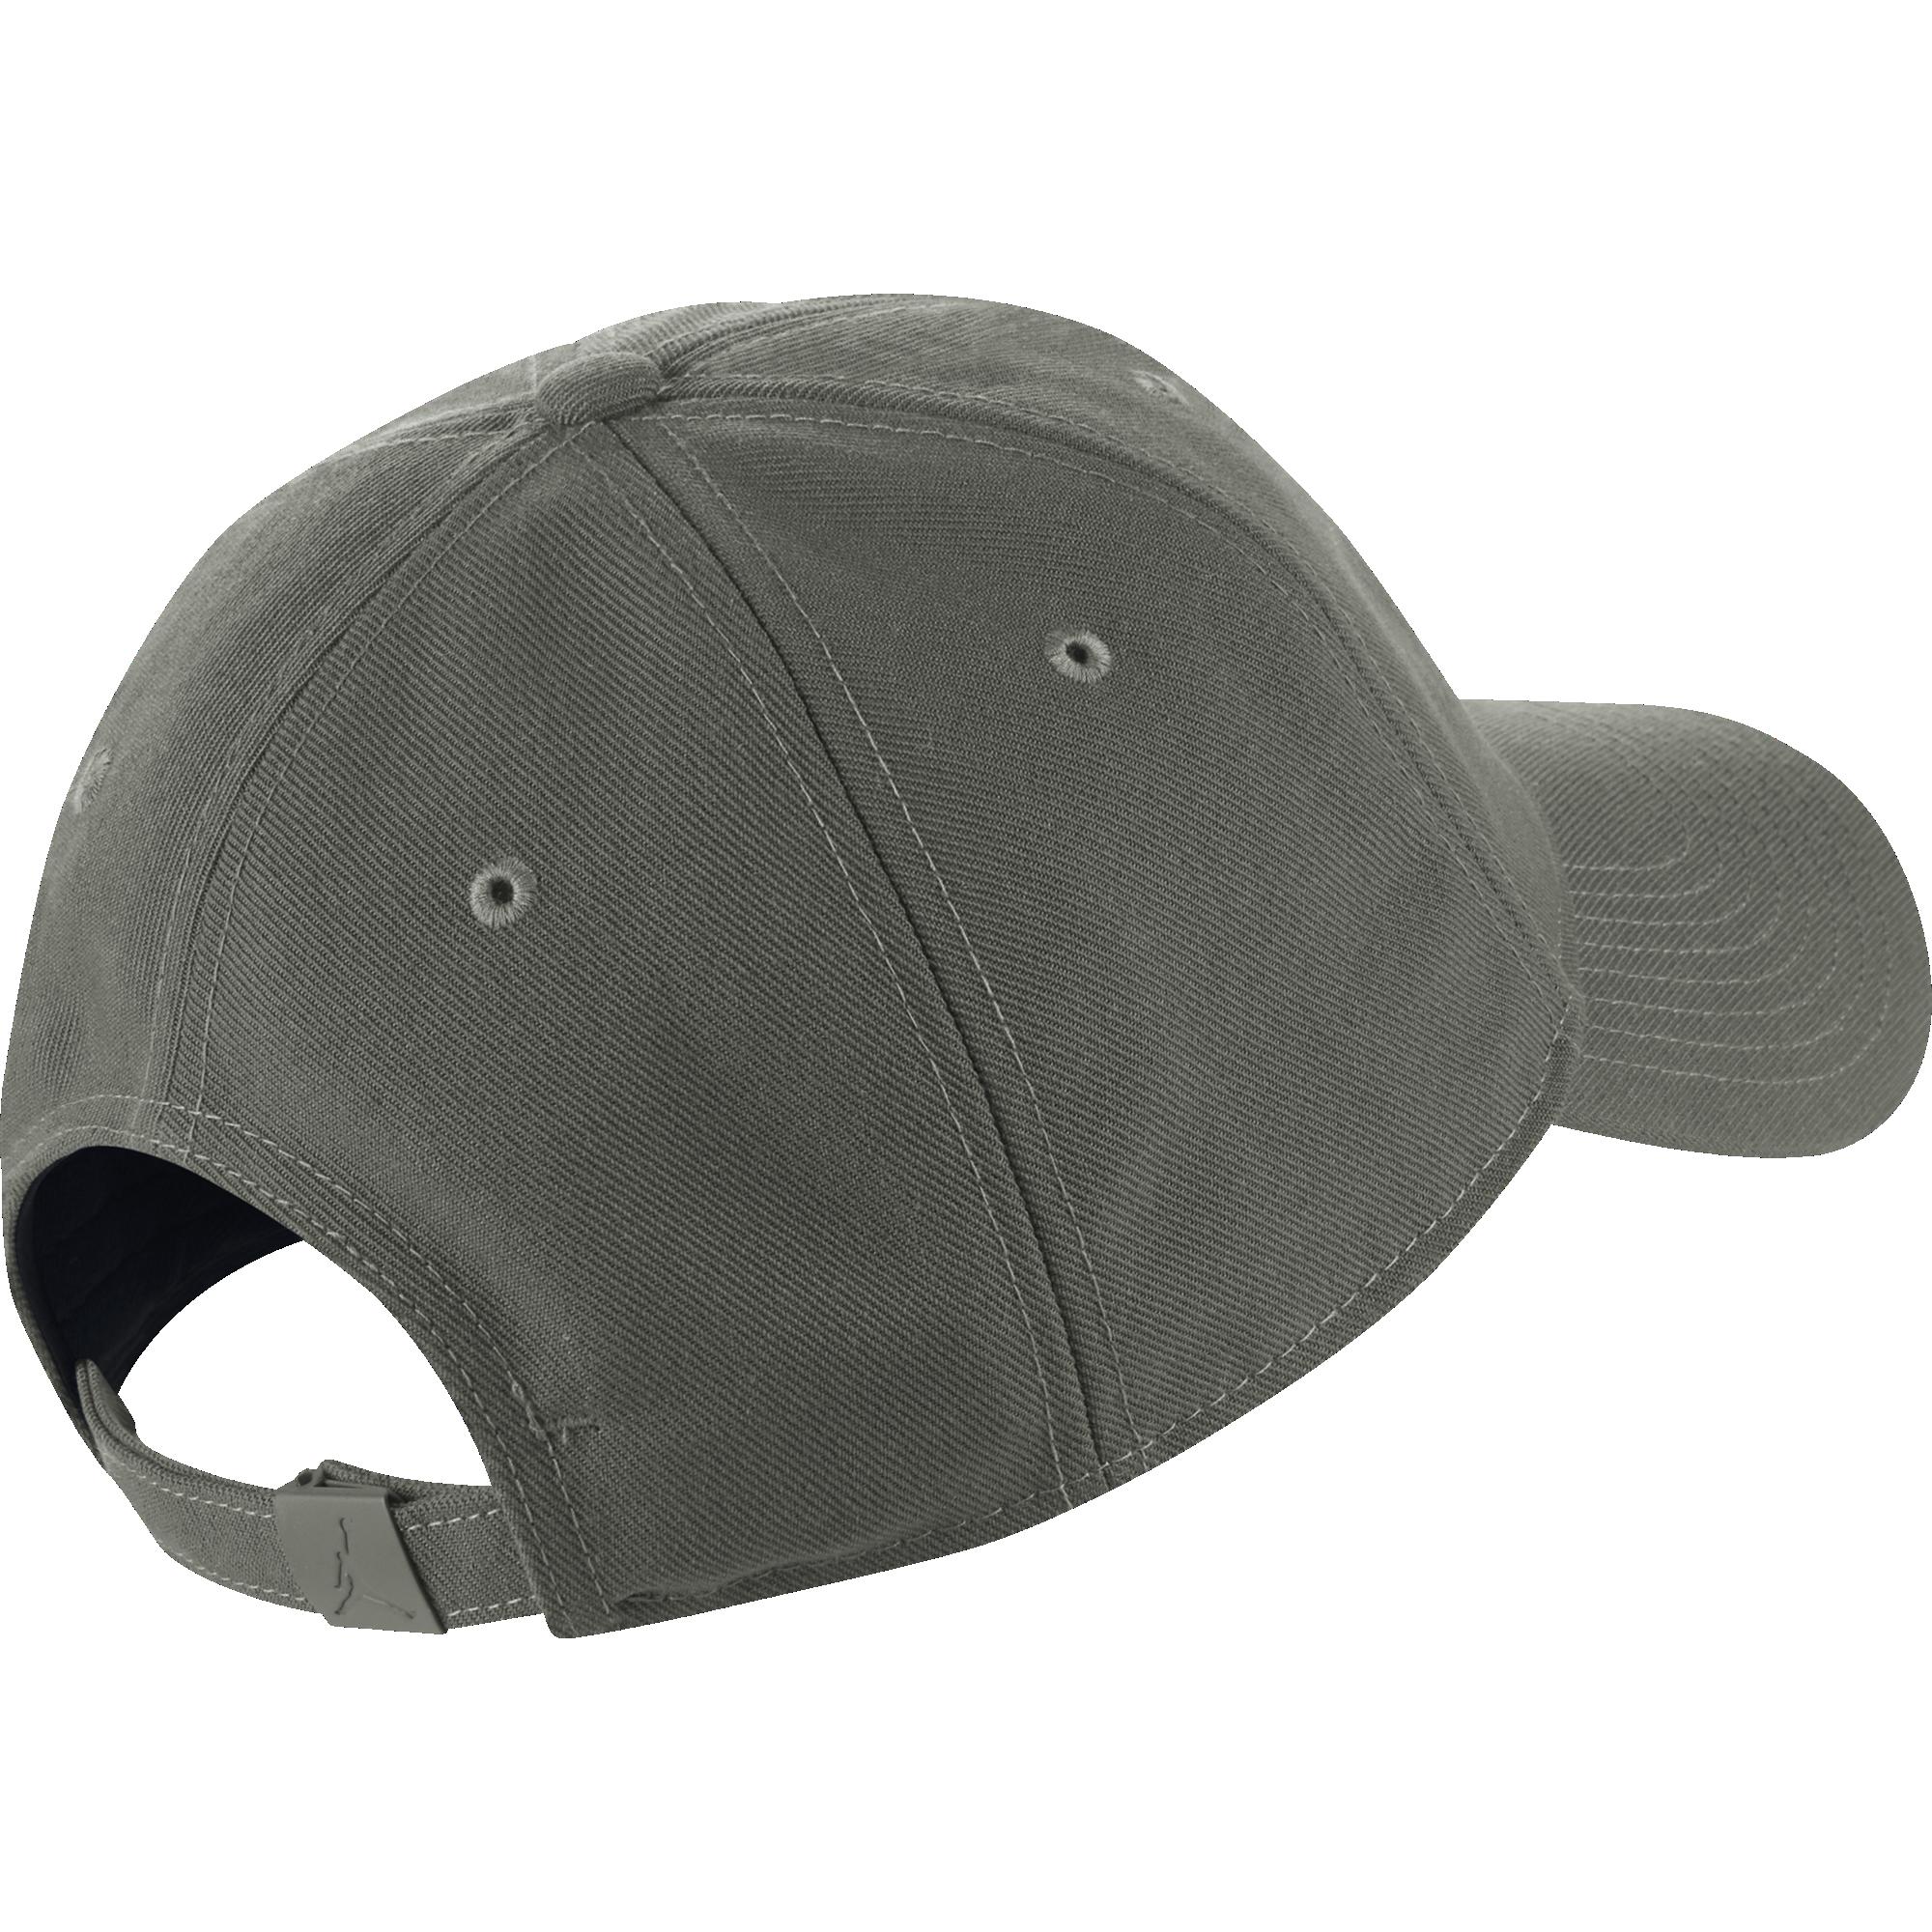 ff1bad03431f AIR JORDAN JUMPMAN FLOPPY H86 HAT. Previous Next